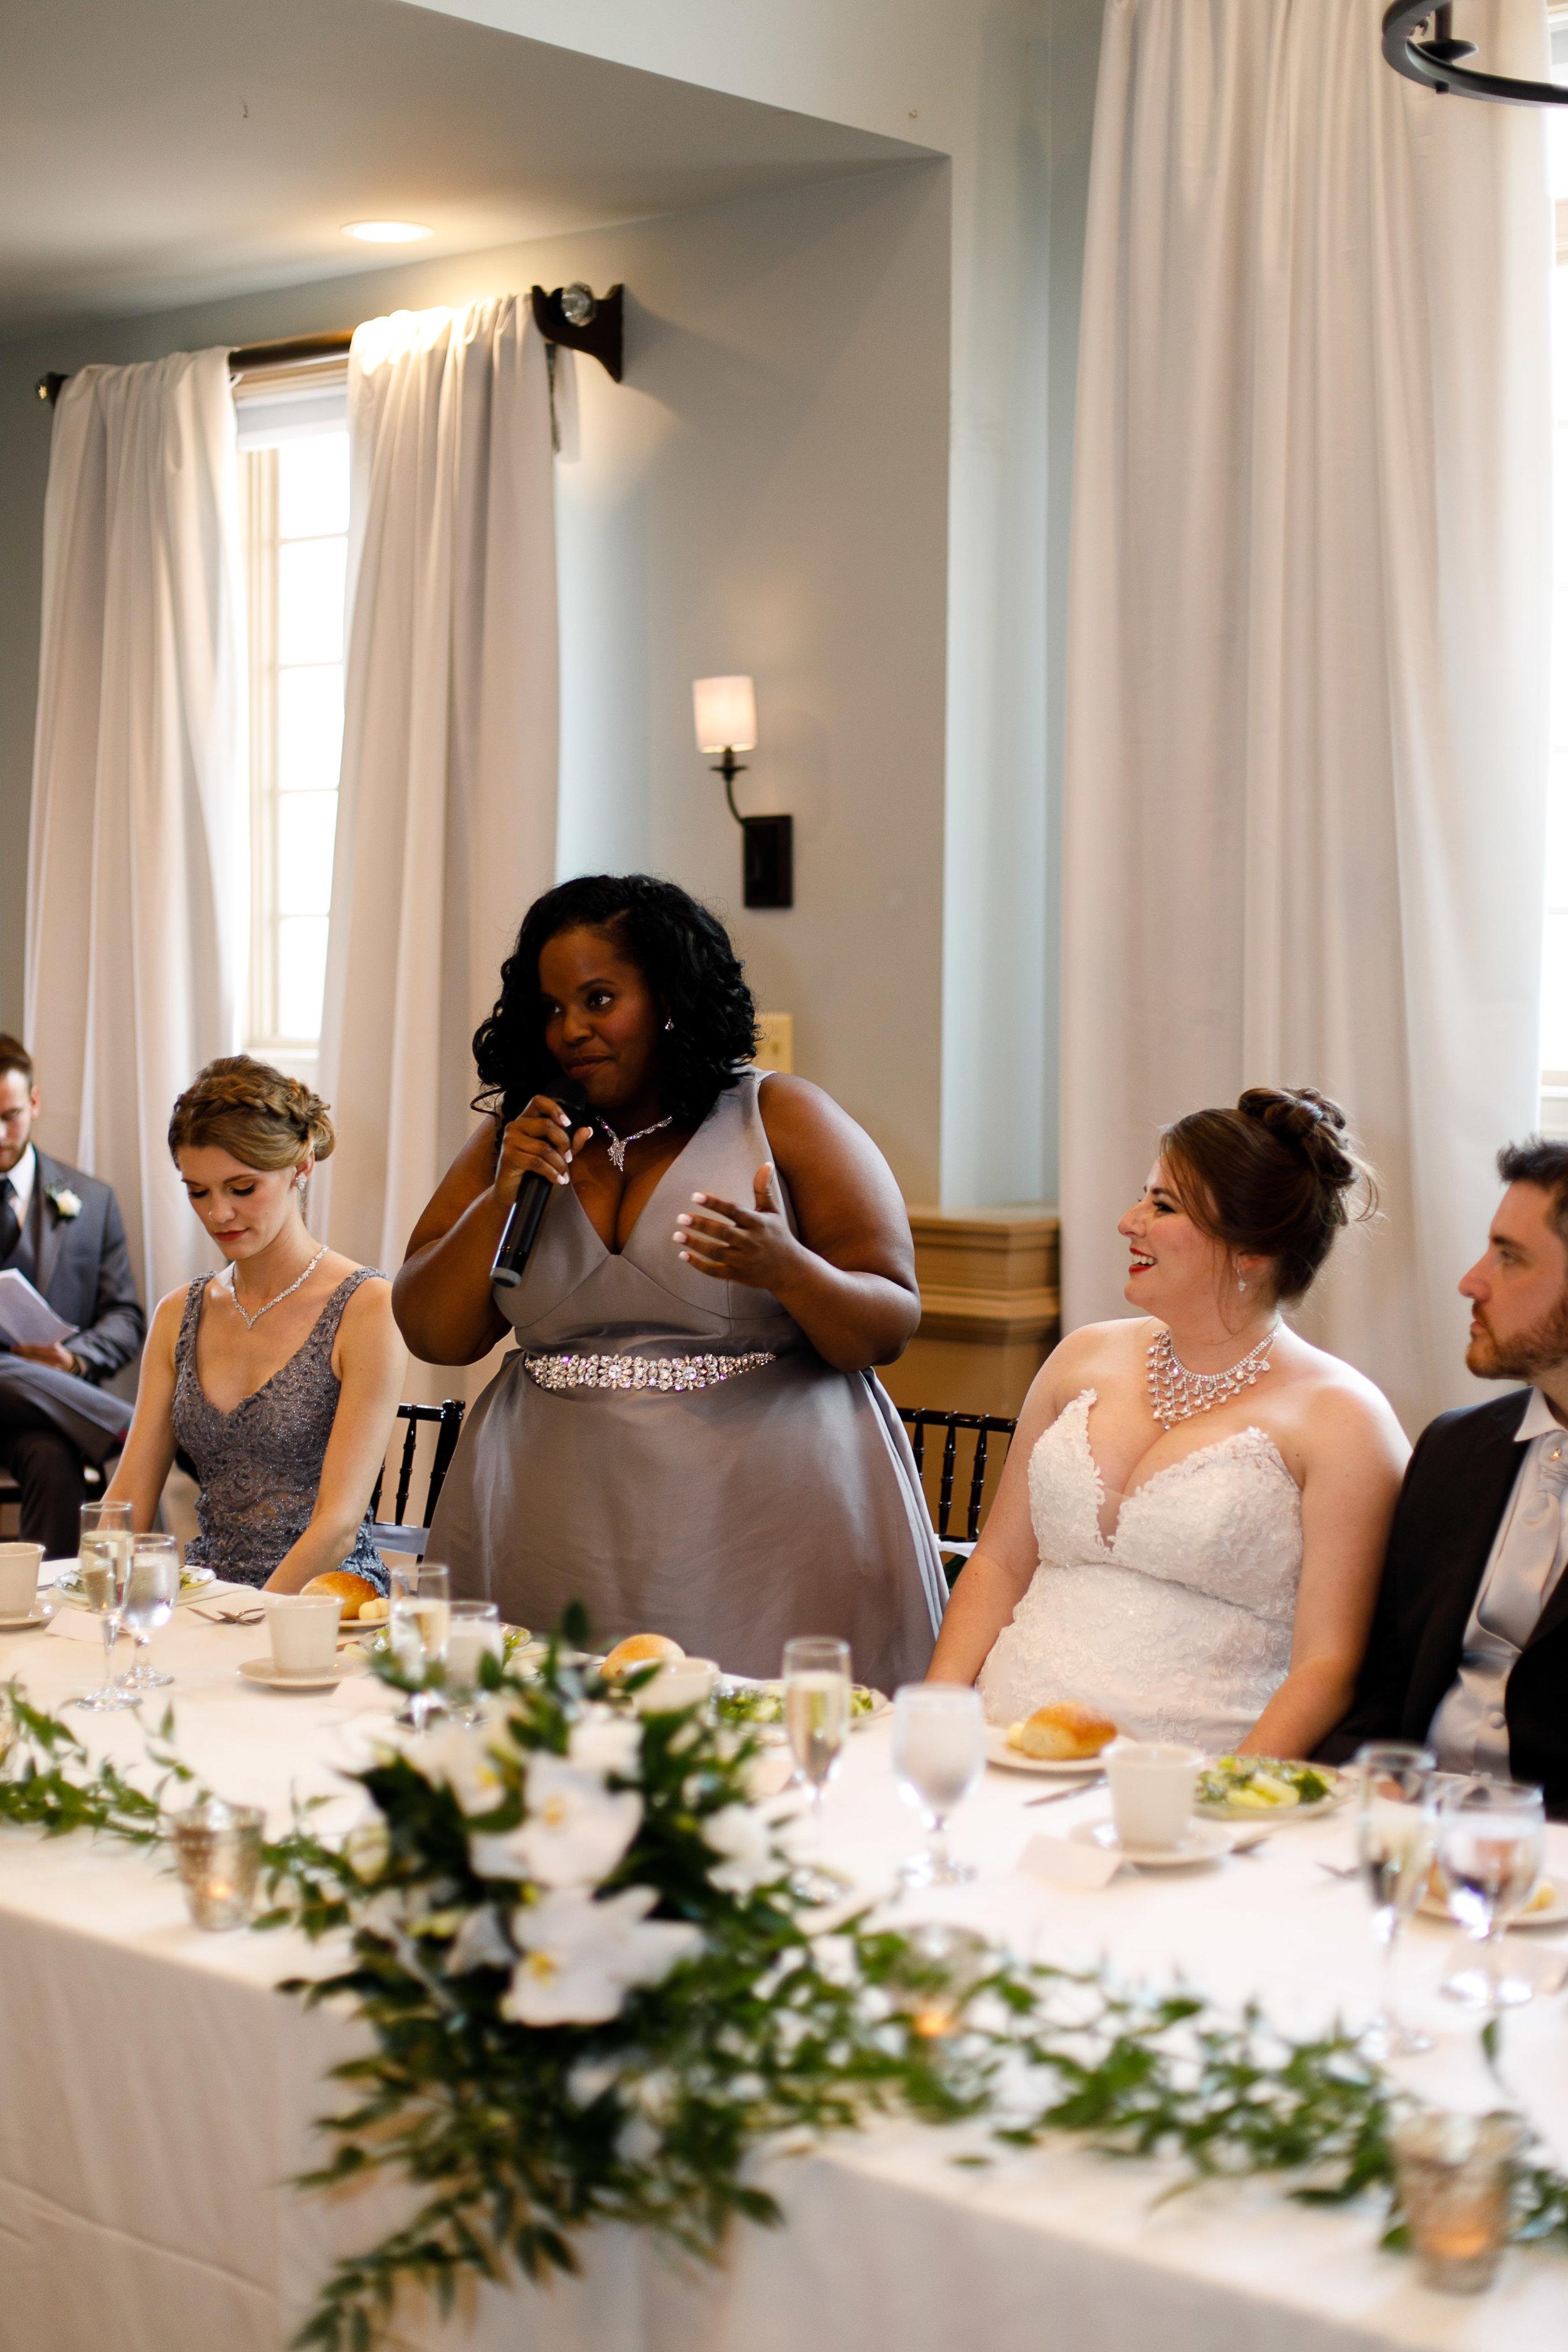 Wedding at Joseph Ambler In Bucks County PA44.jpg